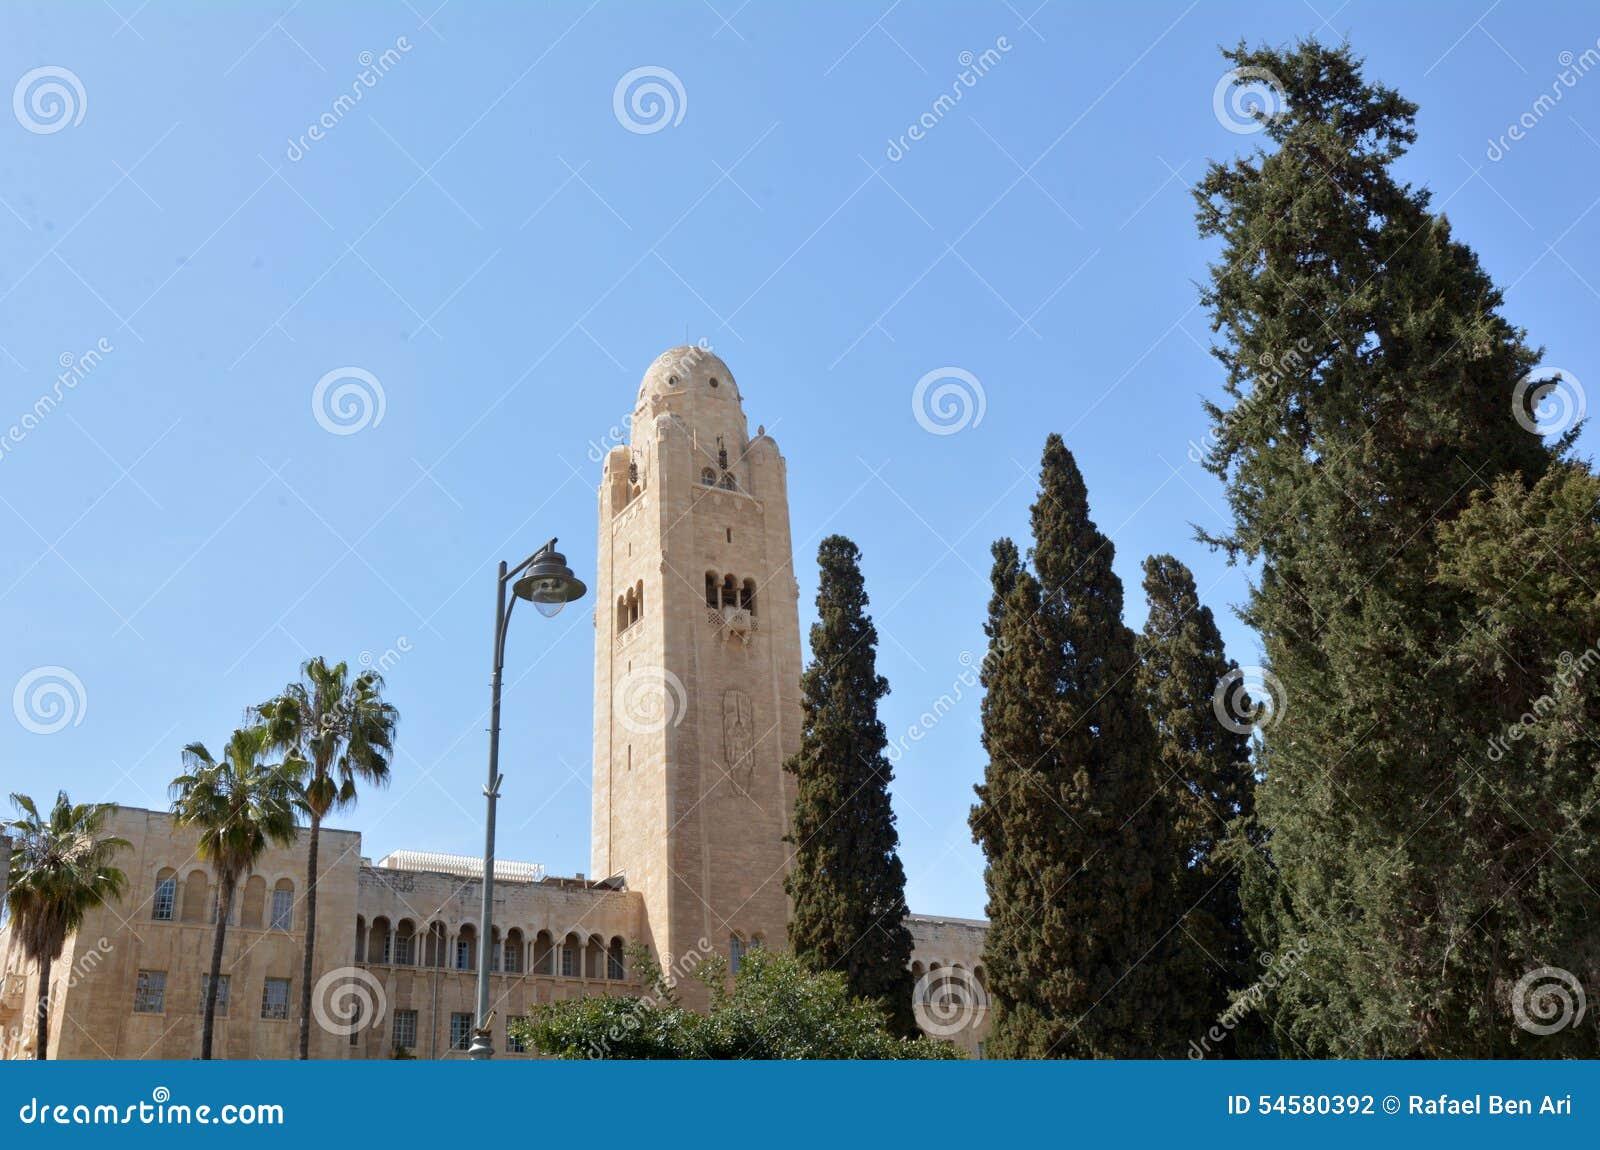 King David Hotel Jerusalem Israel Royalty Free Stock Photography Cartoondealer Com 75194519